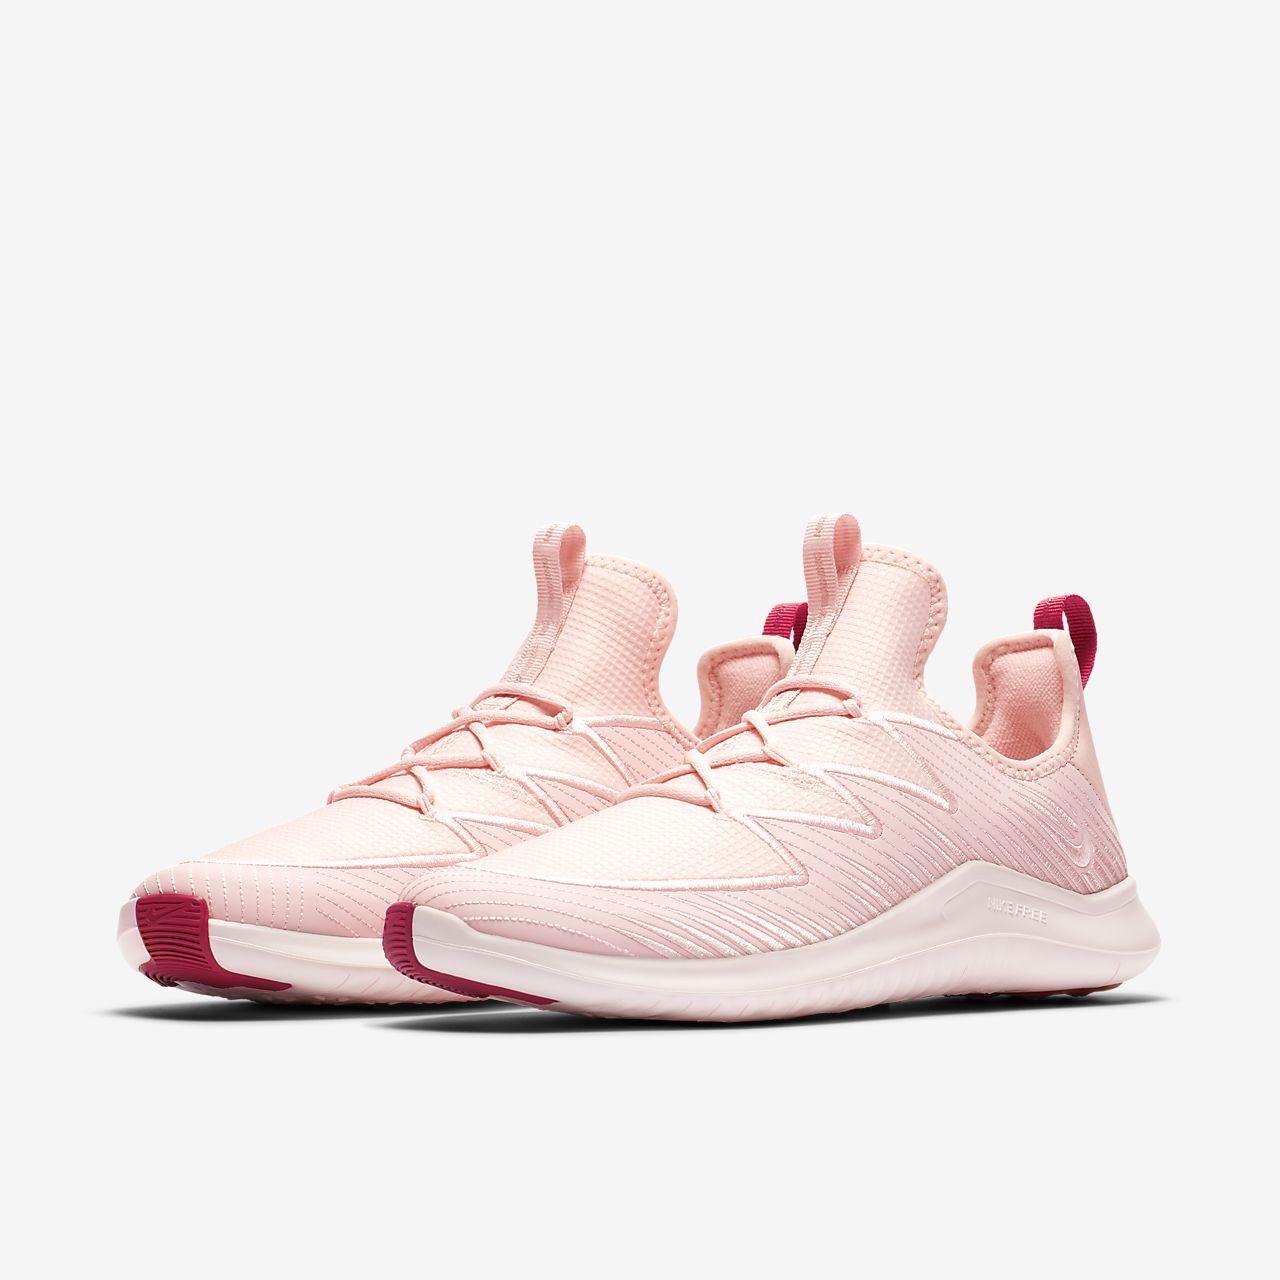 nike shoes light pink